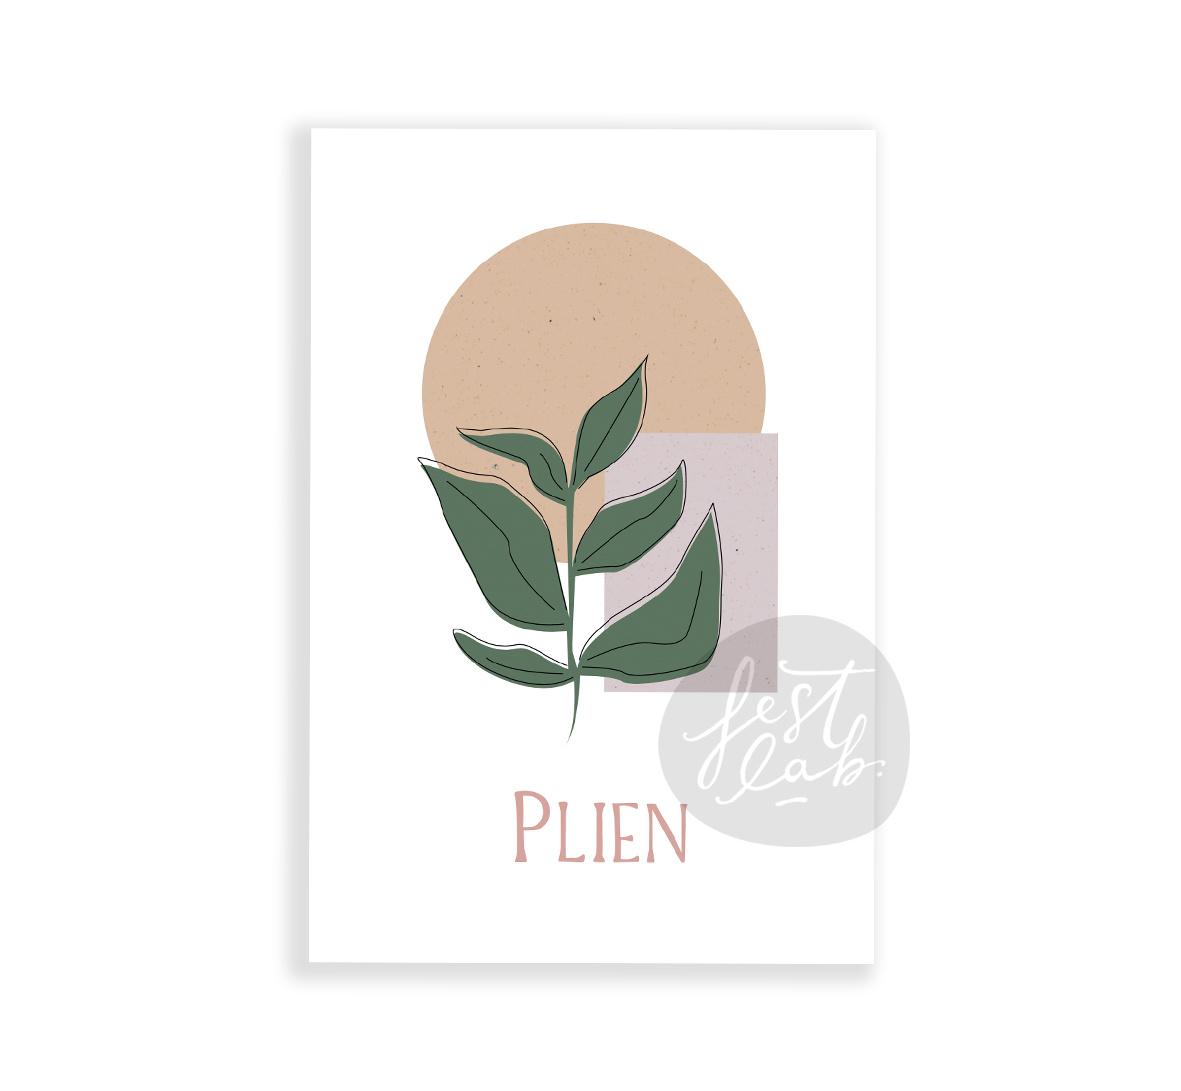 Geboortekaartje Plien